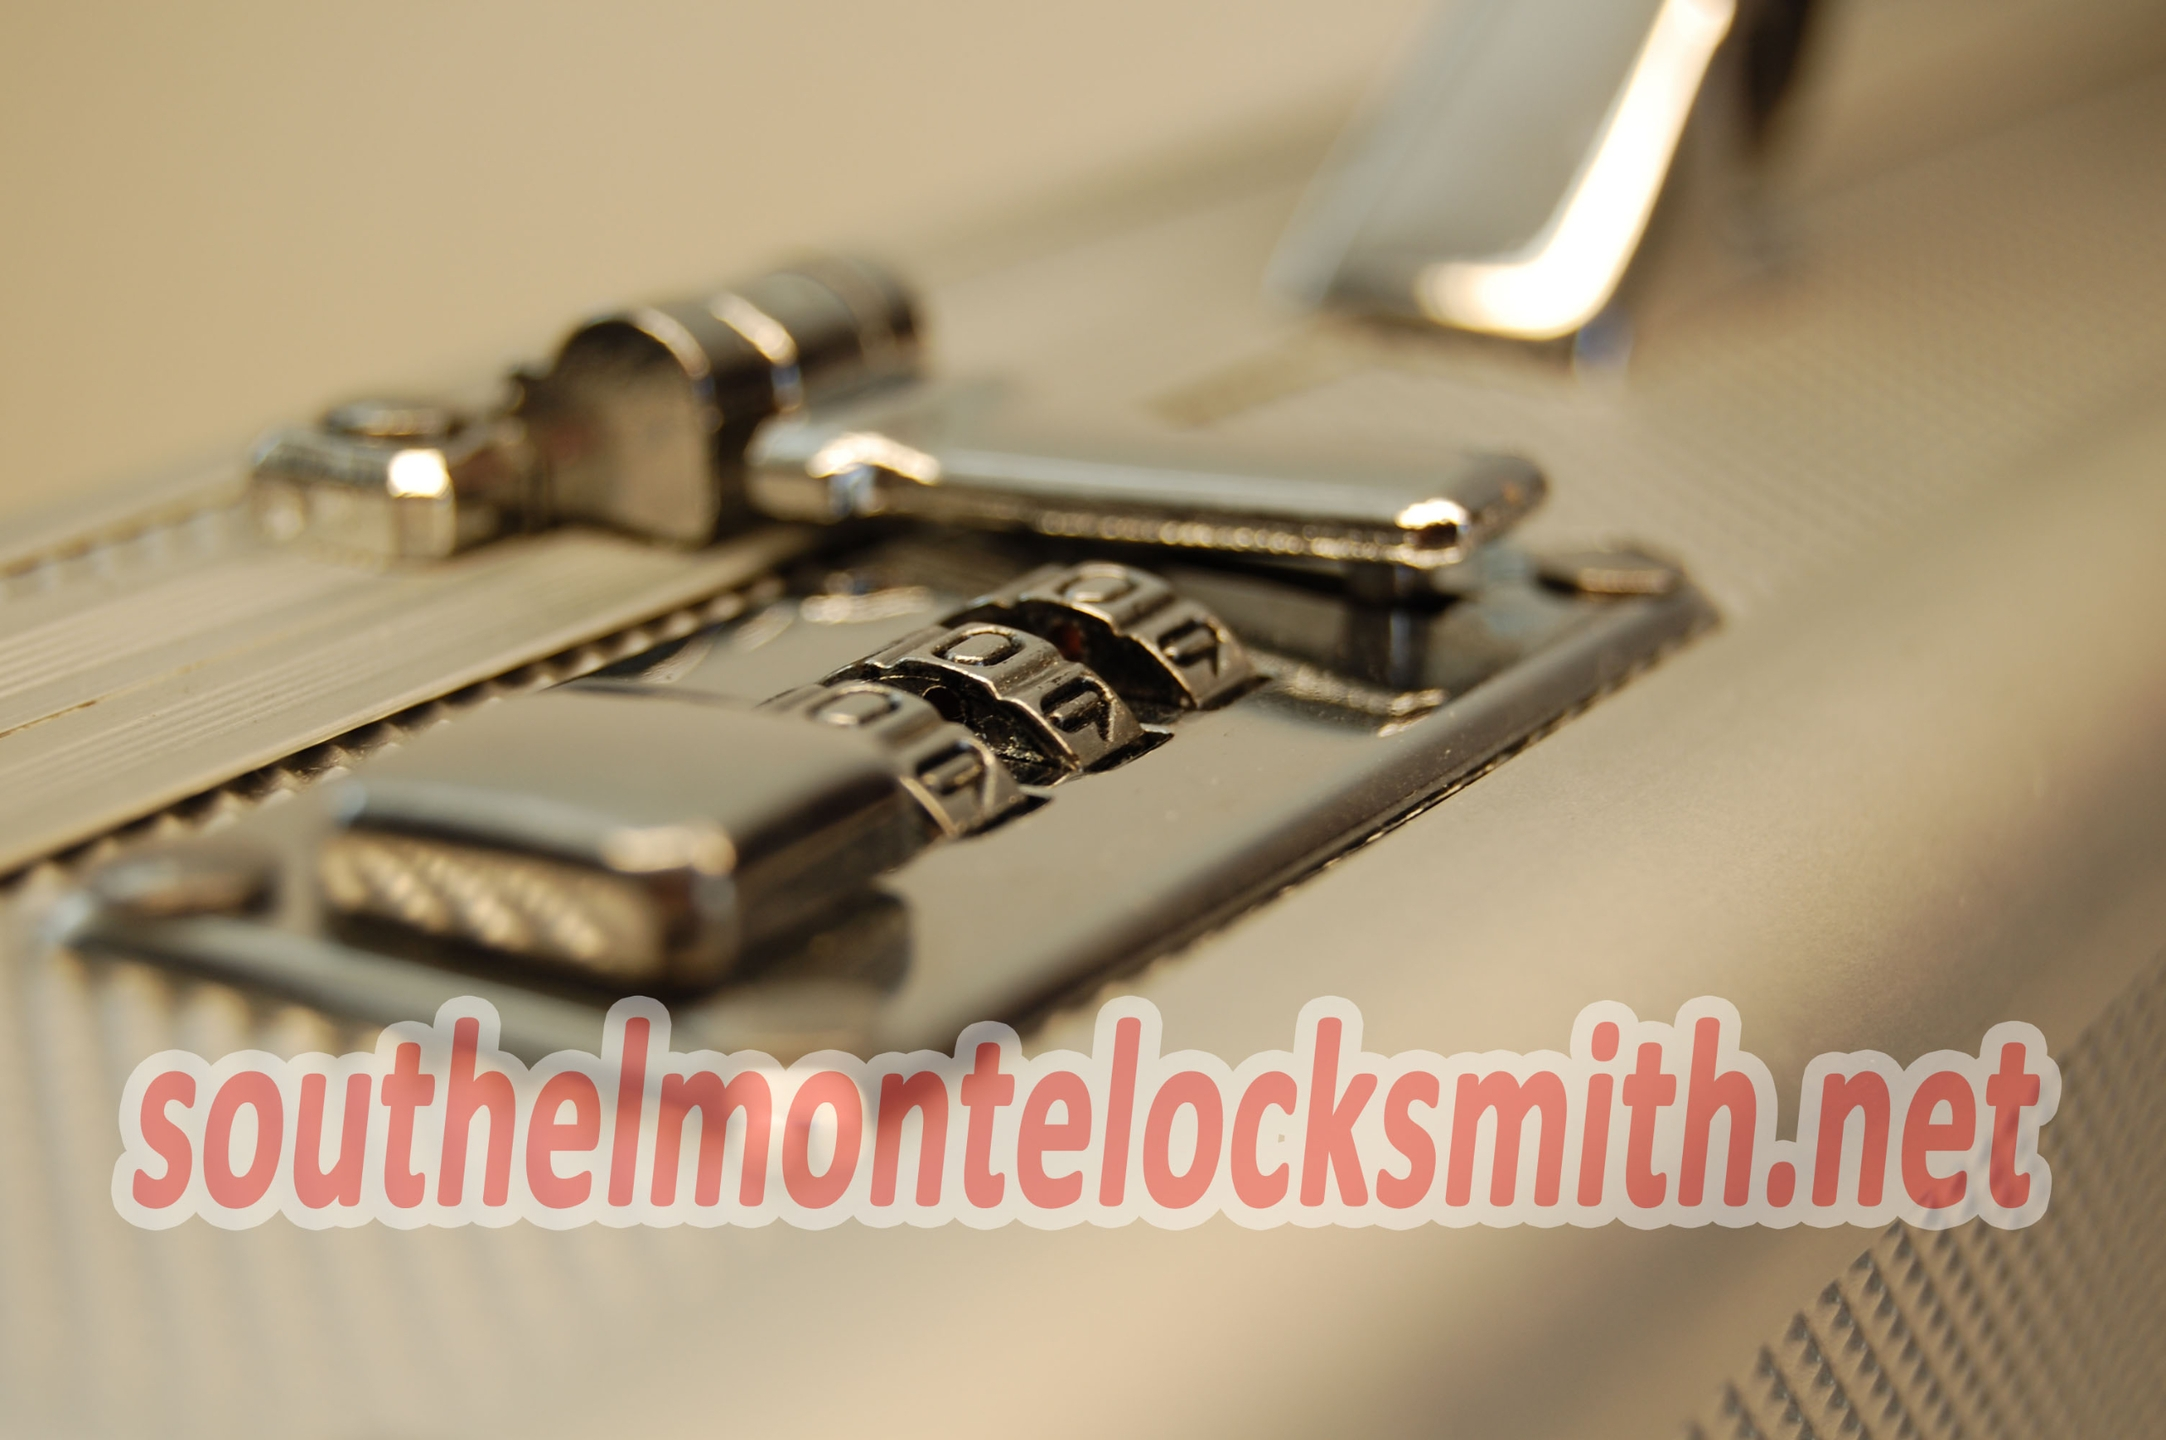 Super El Monte Locksmith (@southelmonteloc) Cover Image